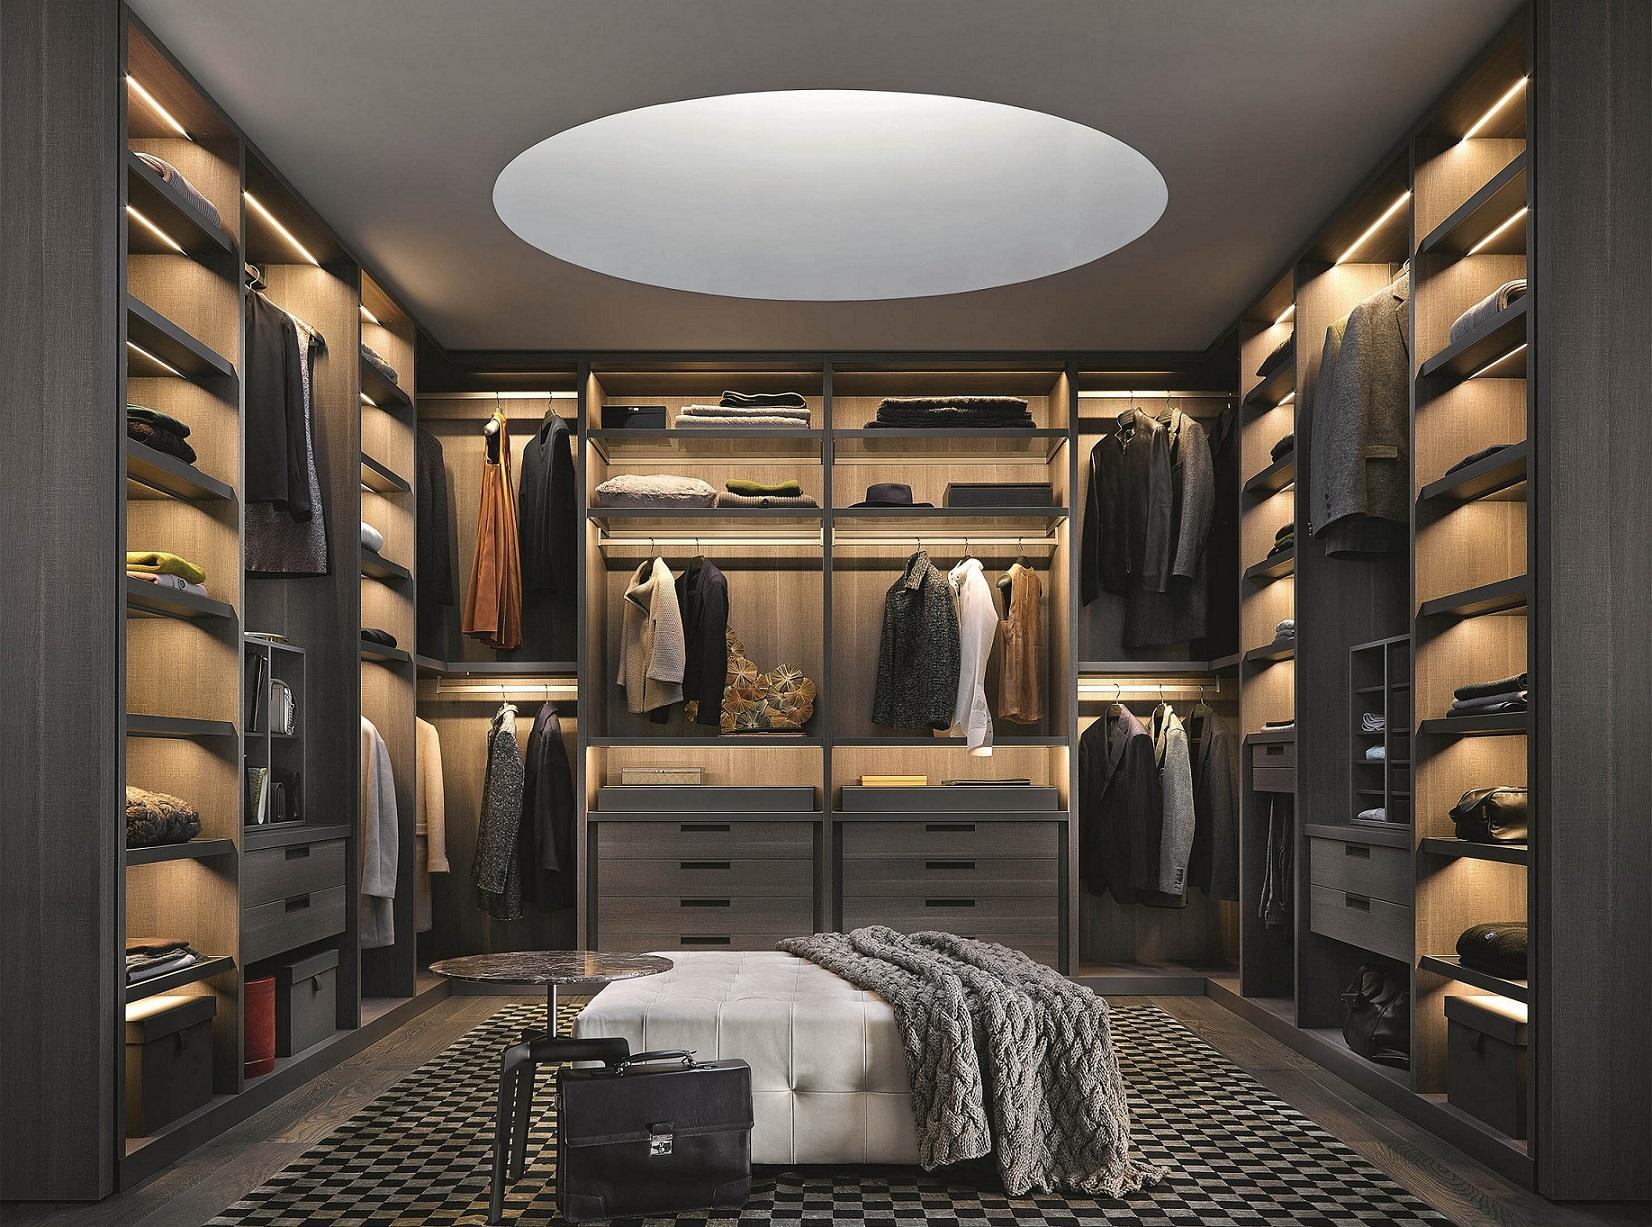 large-walk-in-closet-design-photo-9